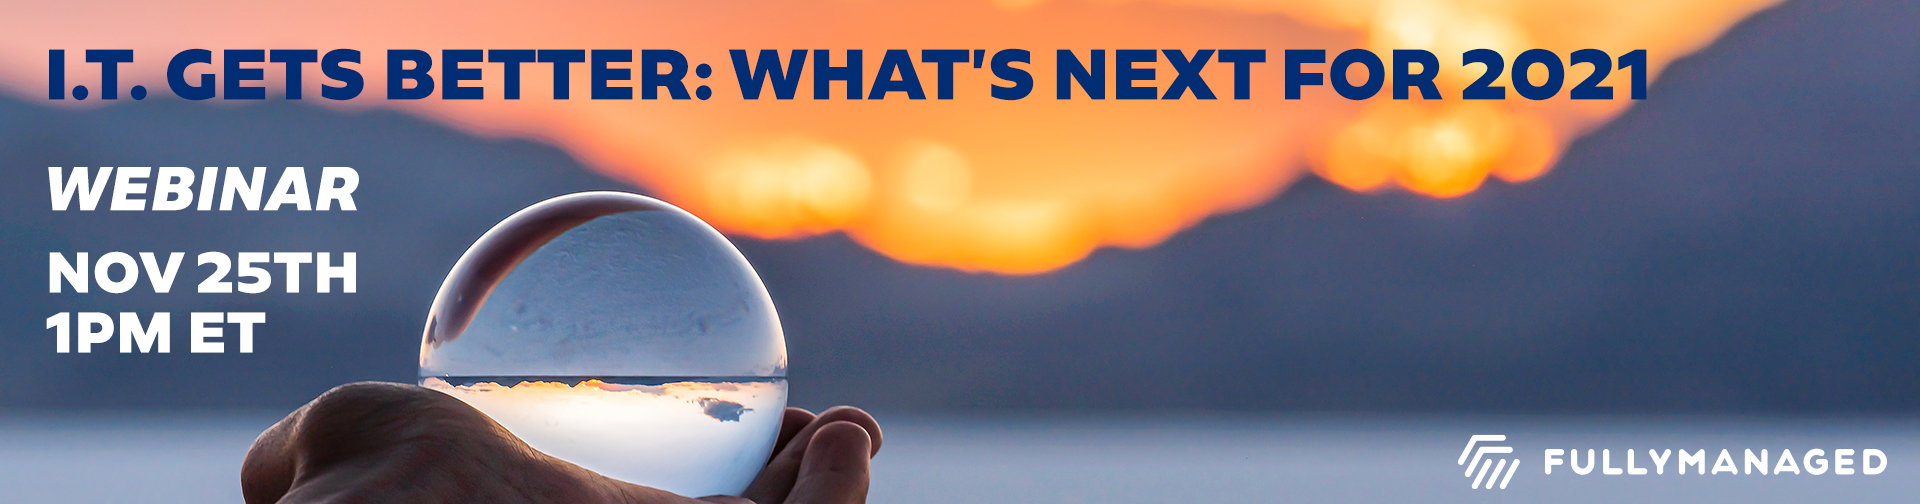 LP-Whats Nextfor2021-20201029